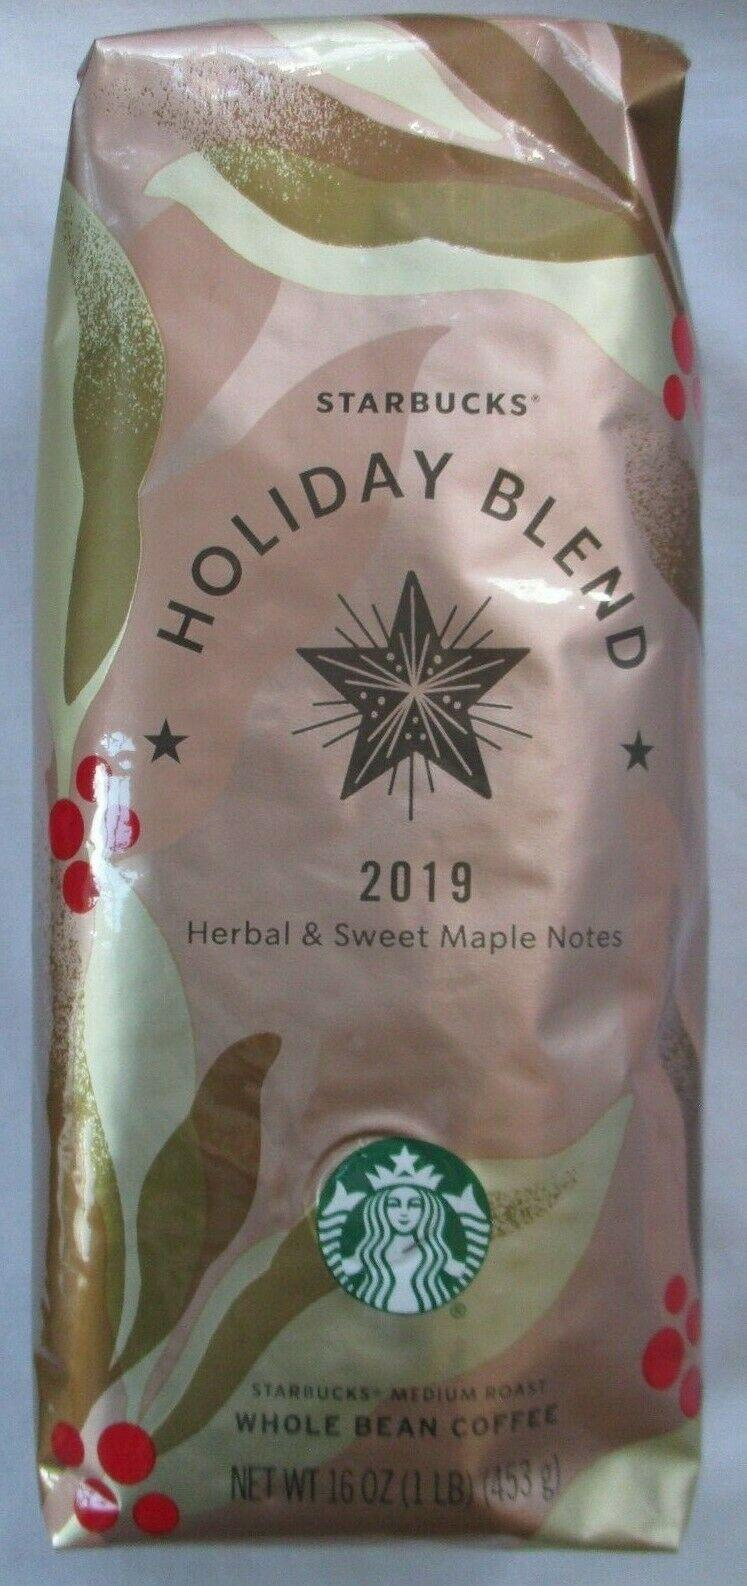 Starbucks Christmas Holiday Blend 2019 Whole Bean Coffee 1 Lb Bag Ideas Of Starbucks Coffee Starbuckscoffe In 2020 Starbucks Christmas Holiday Blend Holiday Coffee